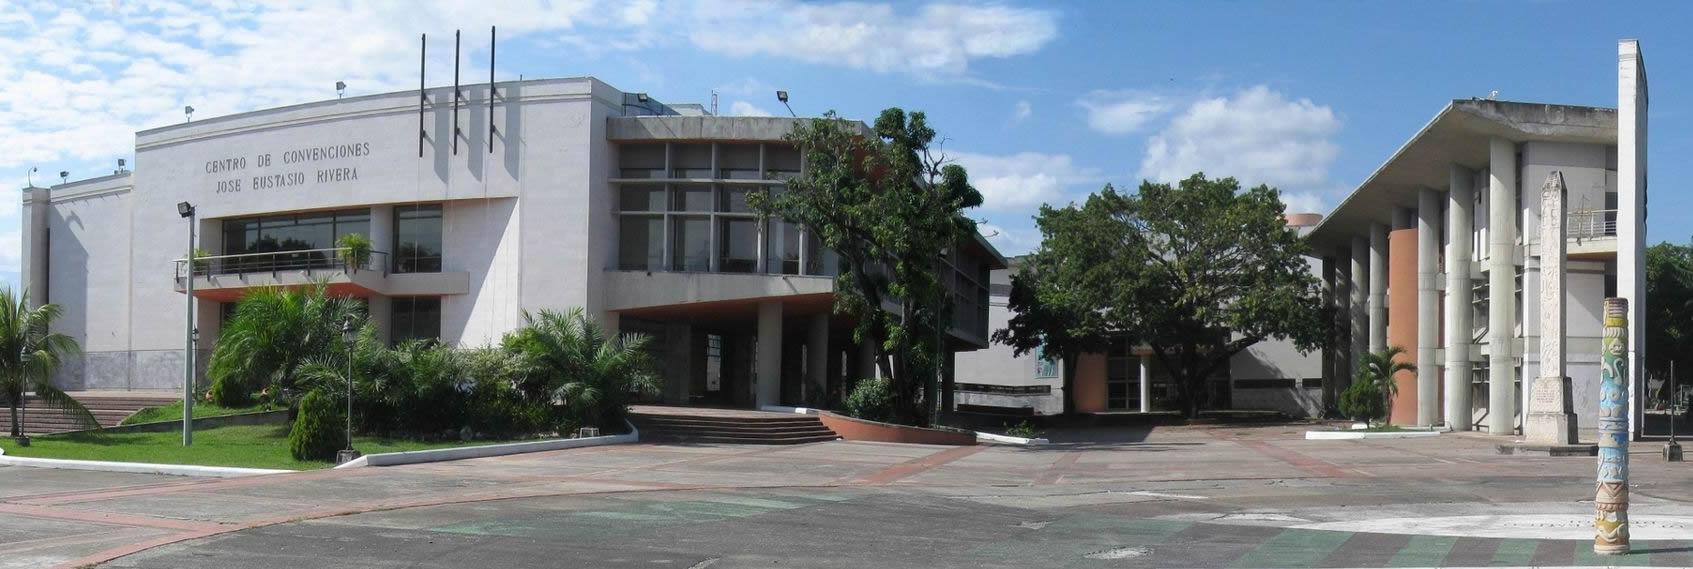 Aeropuerto Neiva Benito Salas (NVA) Transfer In y Transfer Out